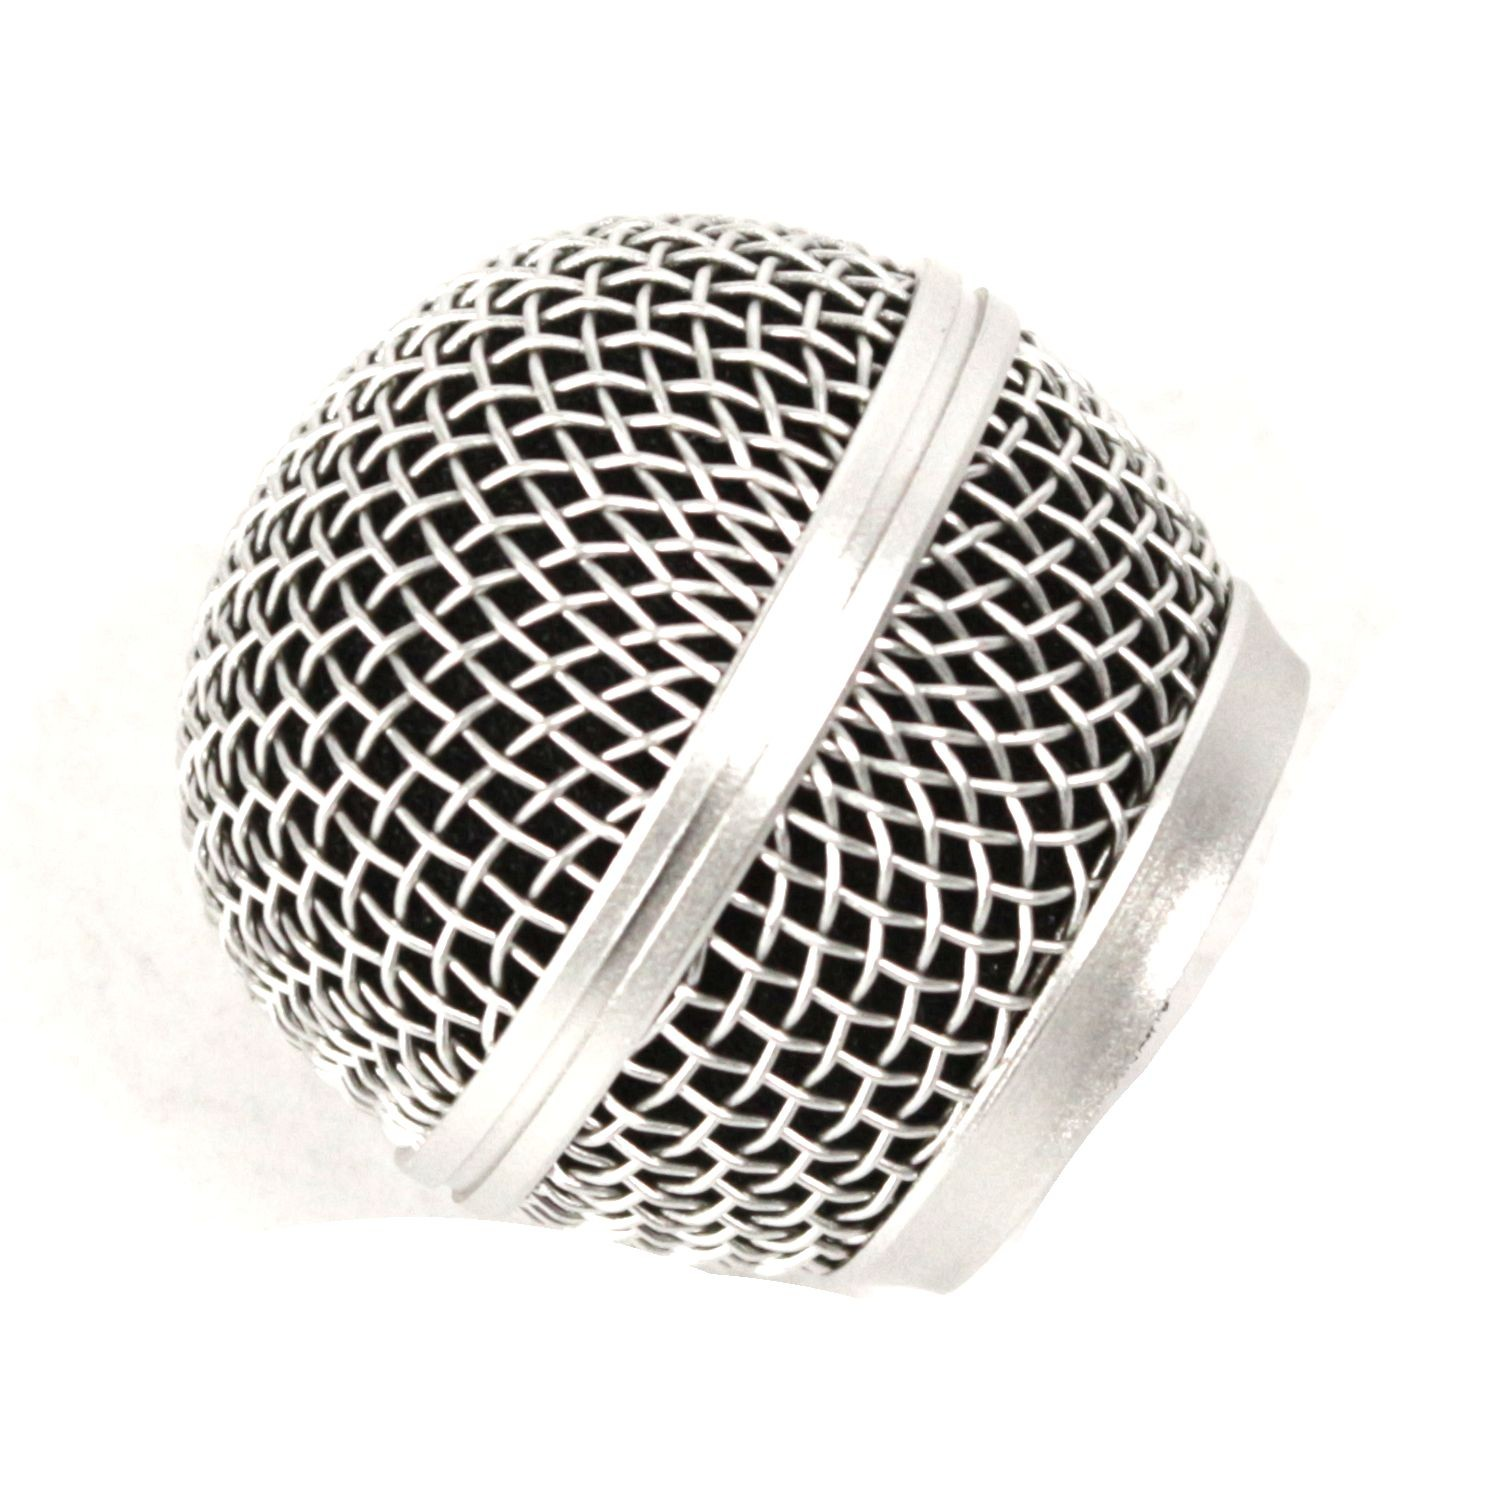 Globo de Microfone Prateado para Shure, LYCO, Tagima